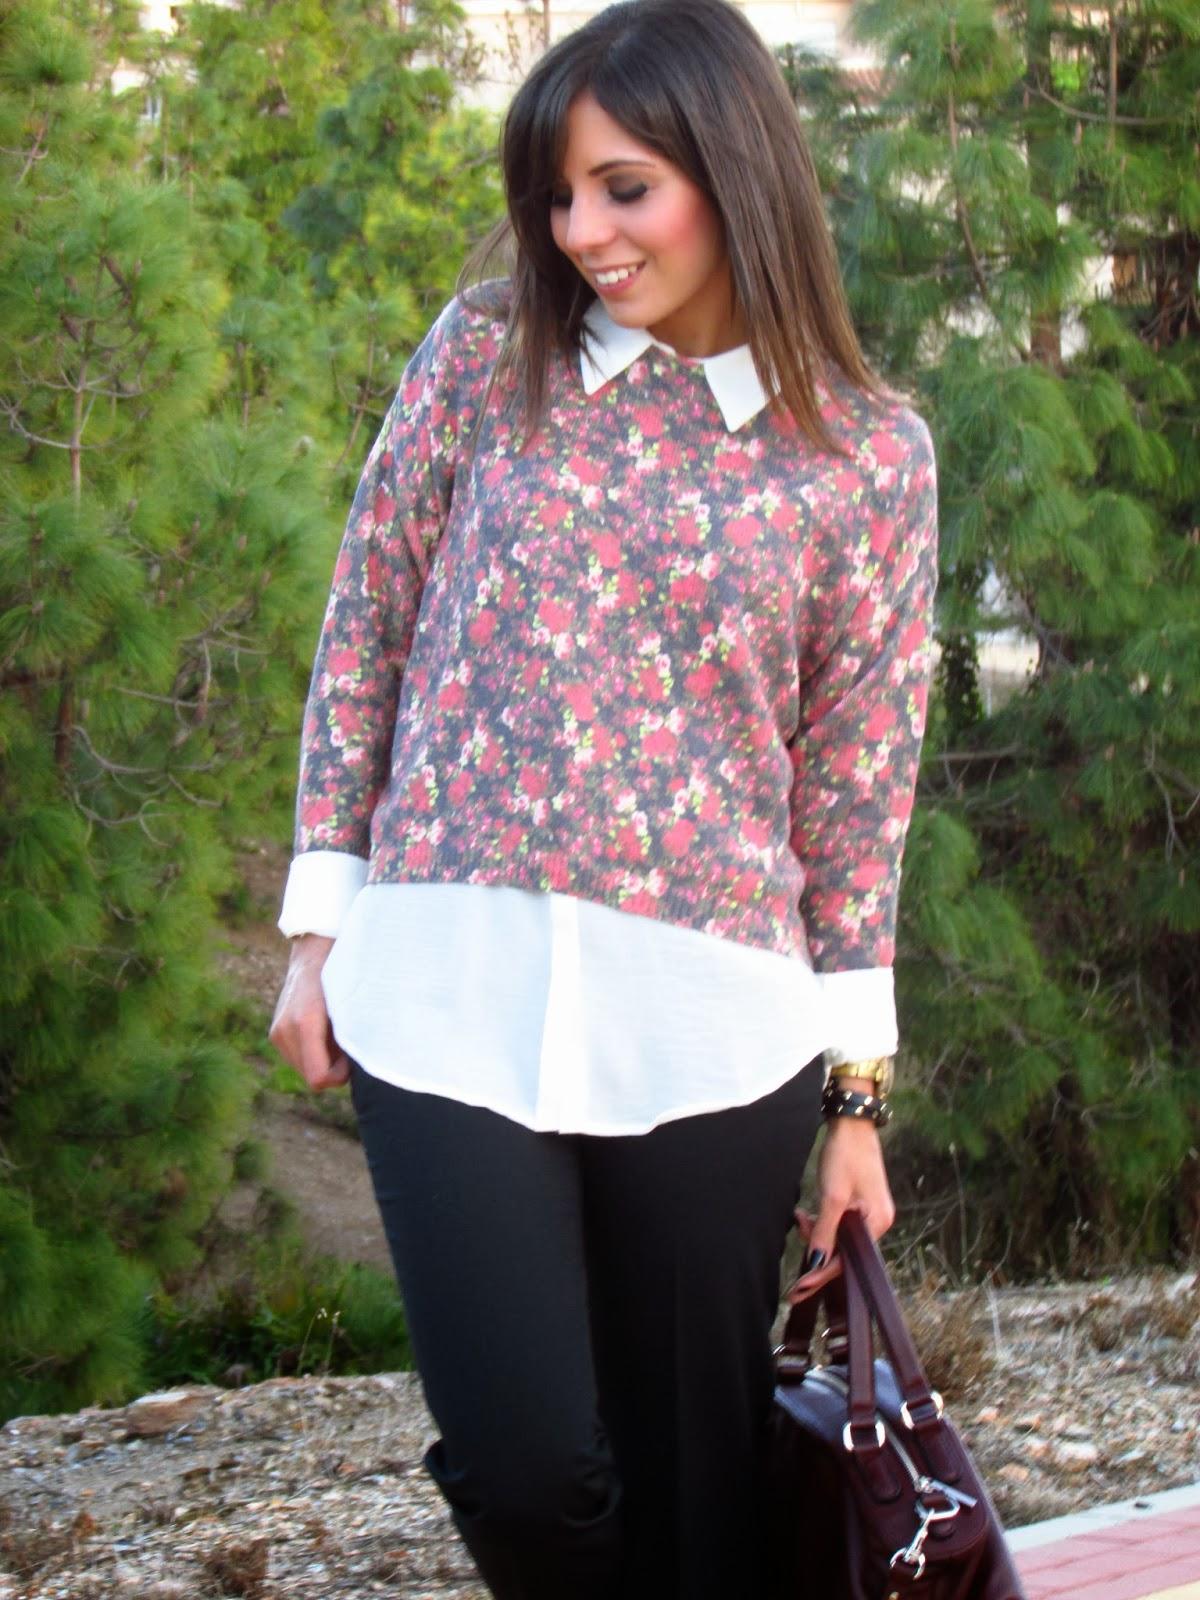 cristina style street style fashion fashion blogger malaga malagueña burgundy tendencias moda inspiration outfits looks ootd  blog